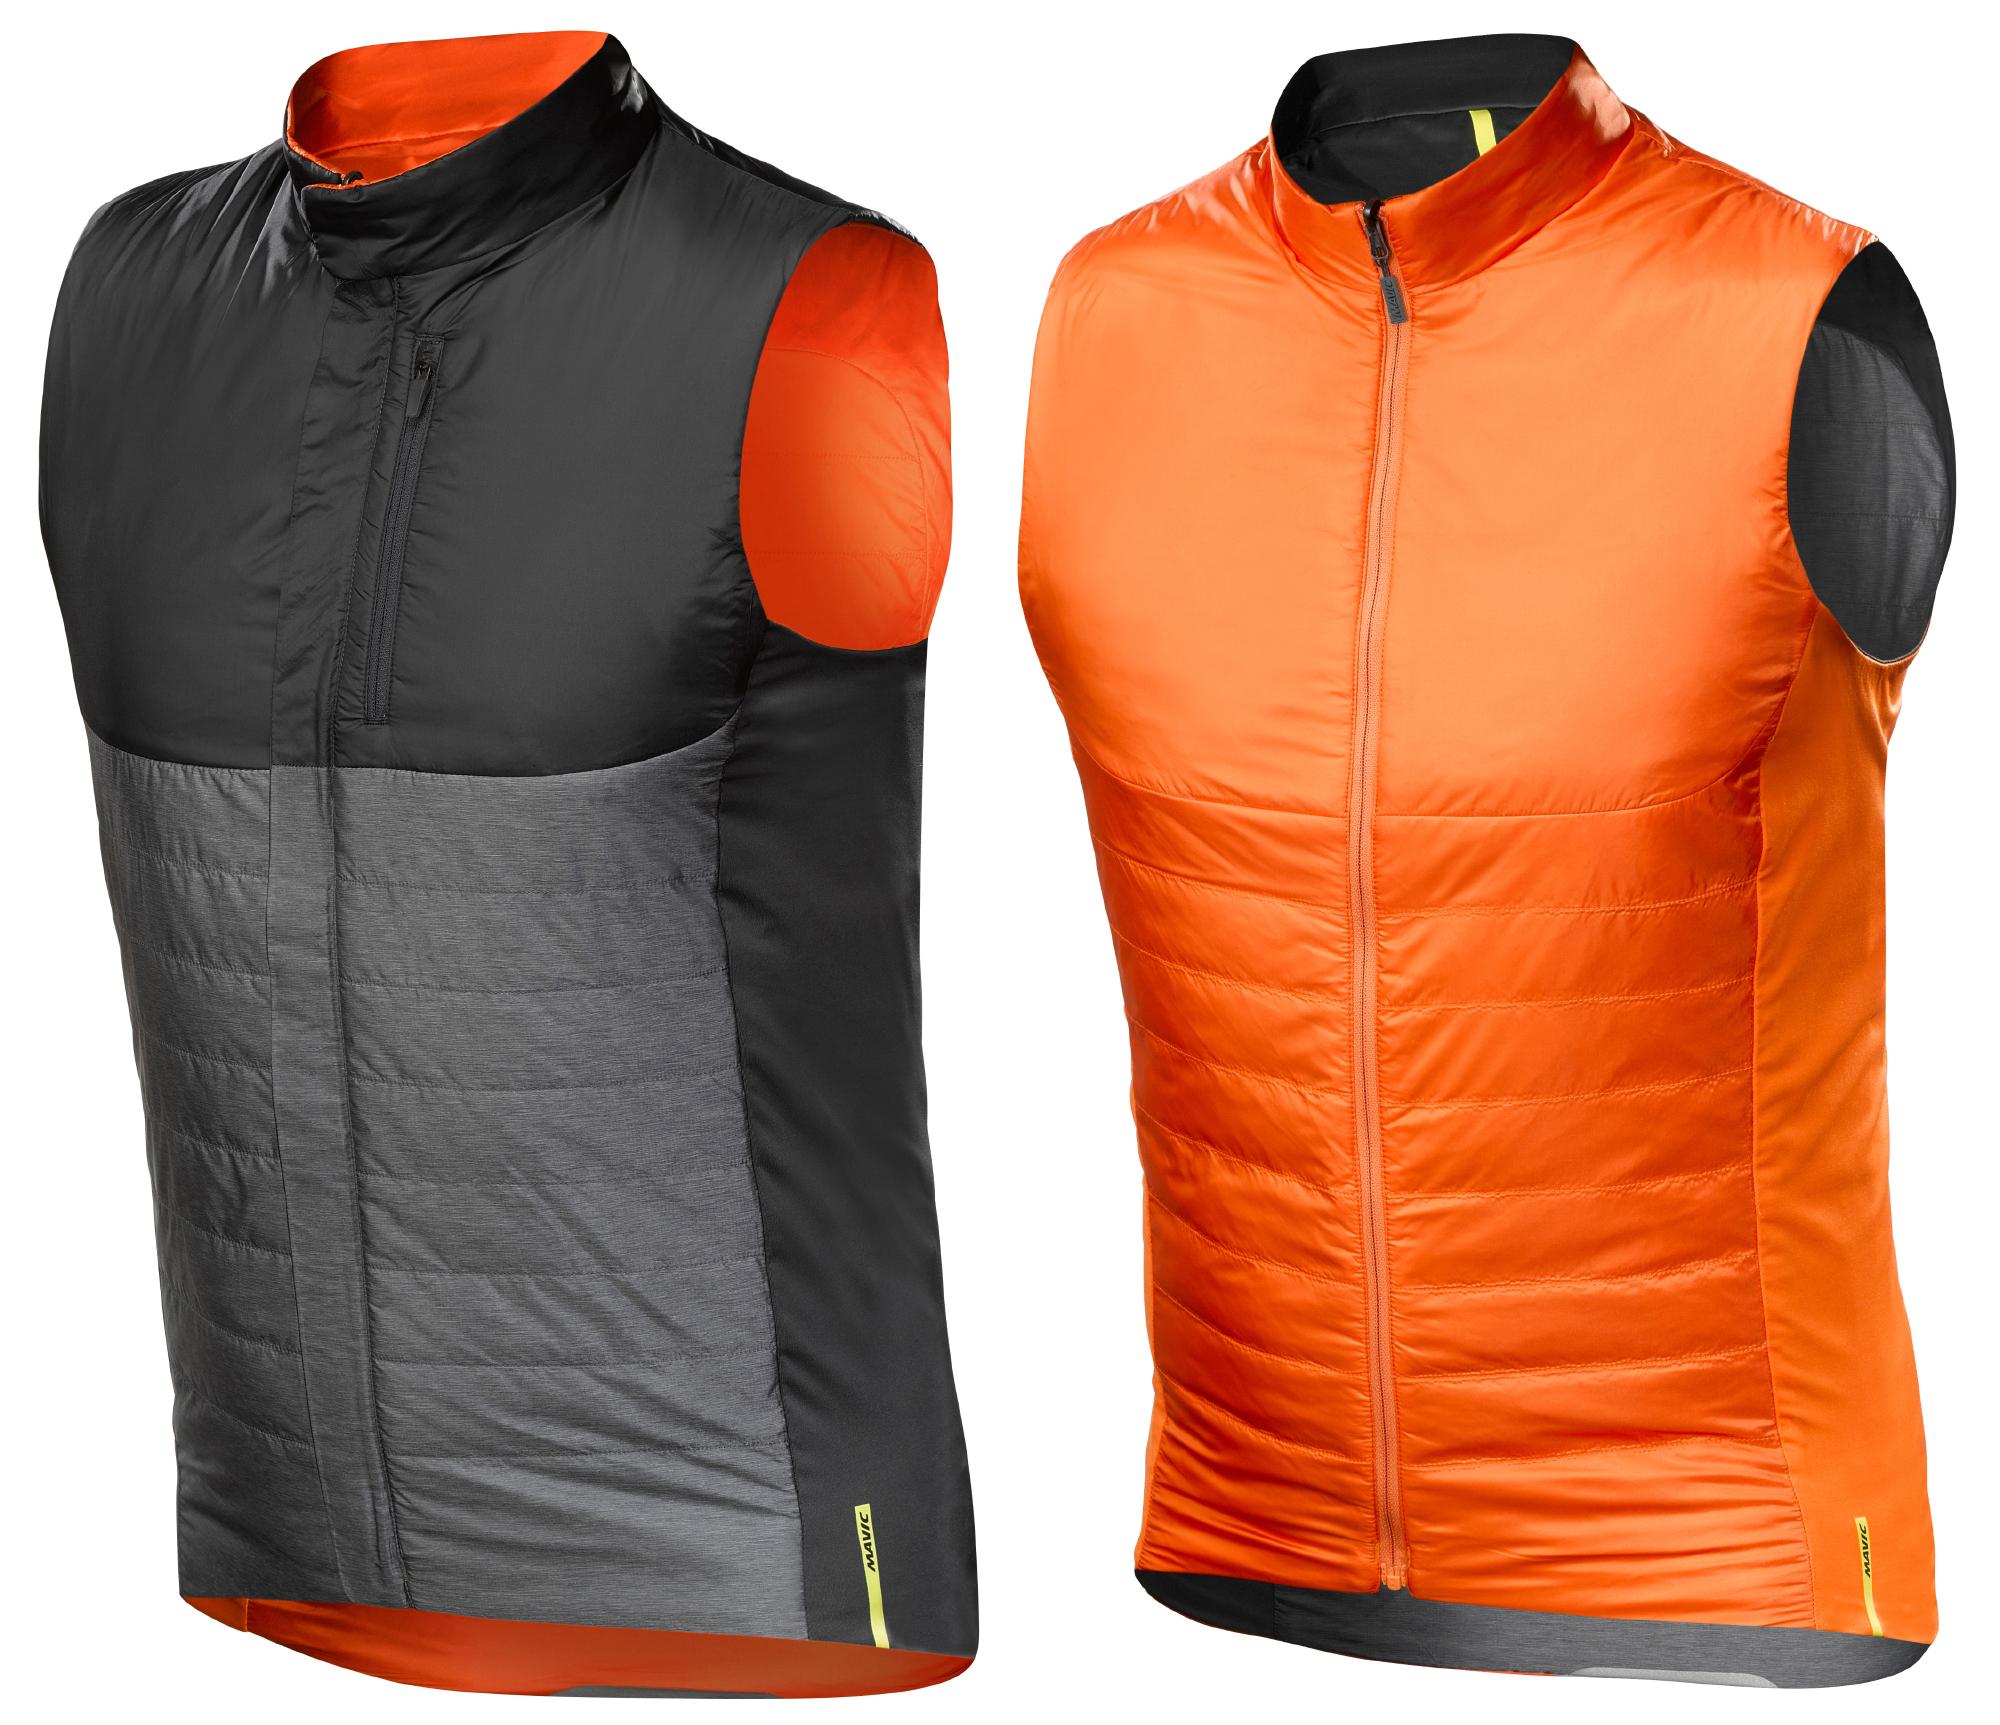 Mavic Allroad Insulate Vest - Primaloft cykelvest - Vendbar - Grå, Sort, Orange | Vests